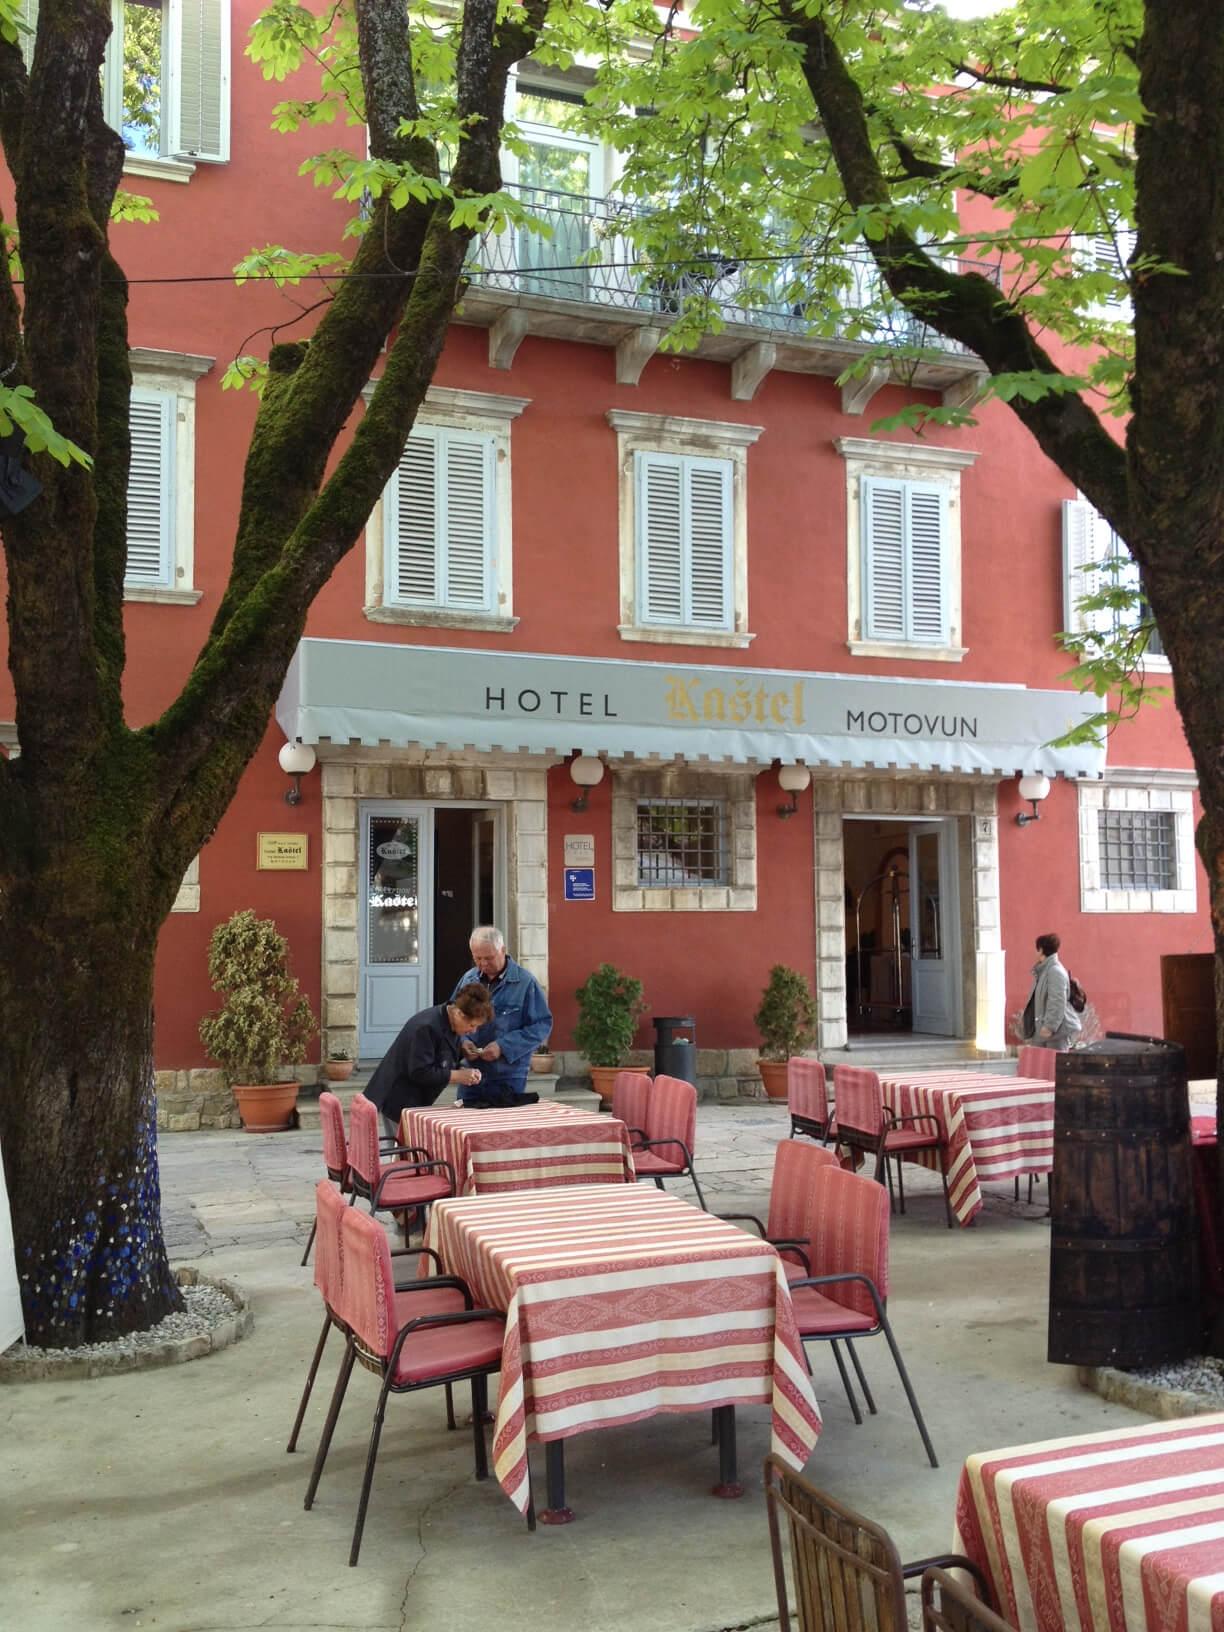 Facade of the Hotel Kastel